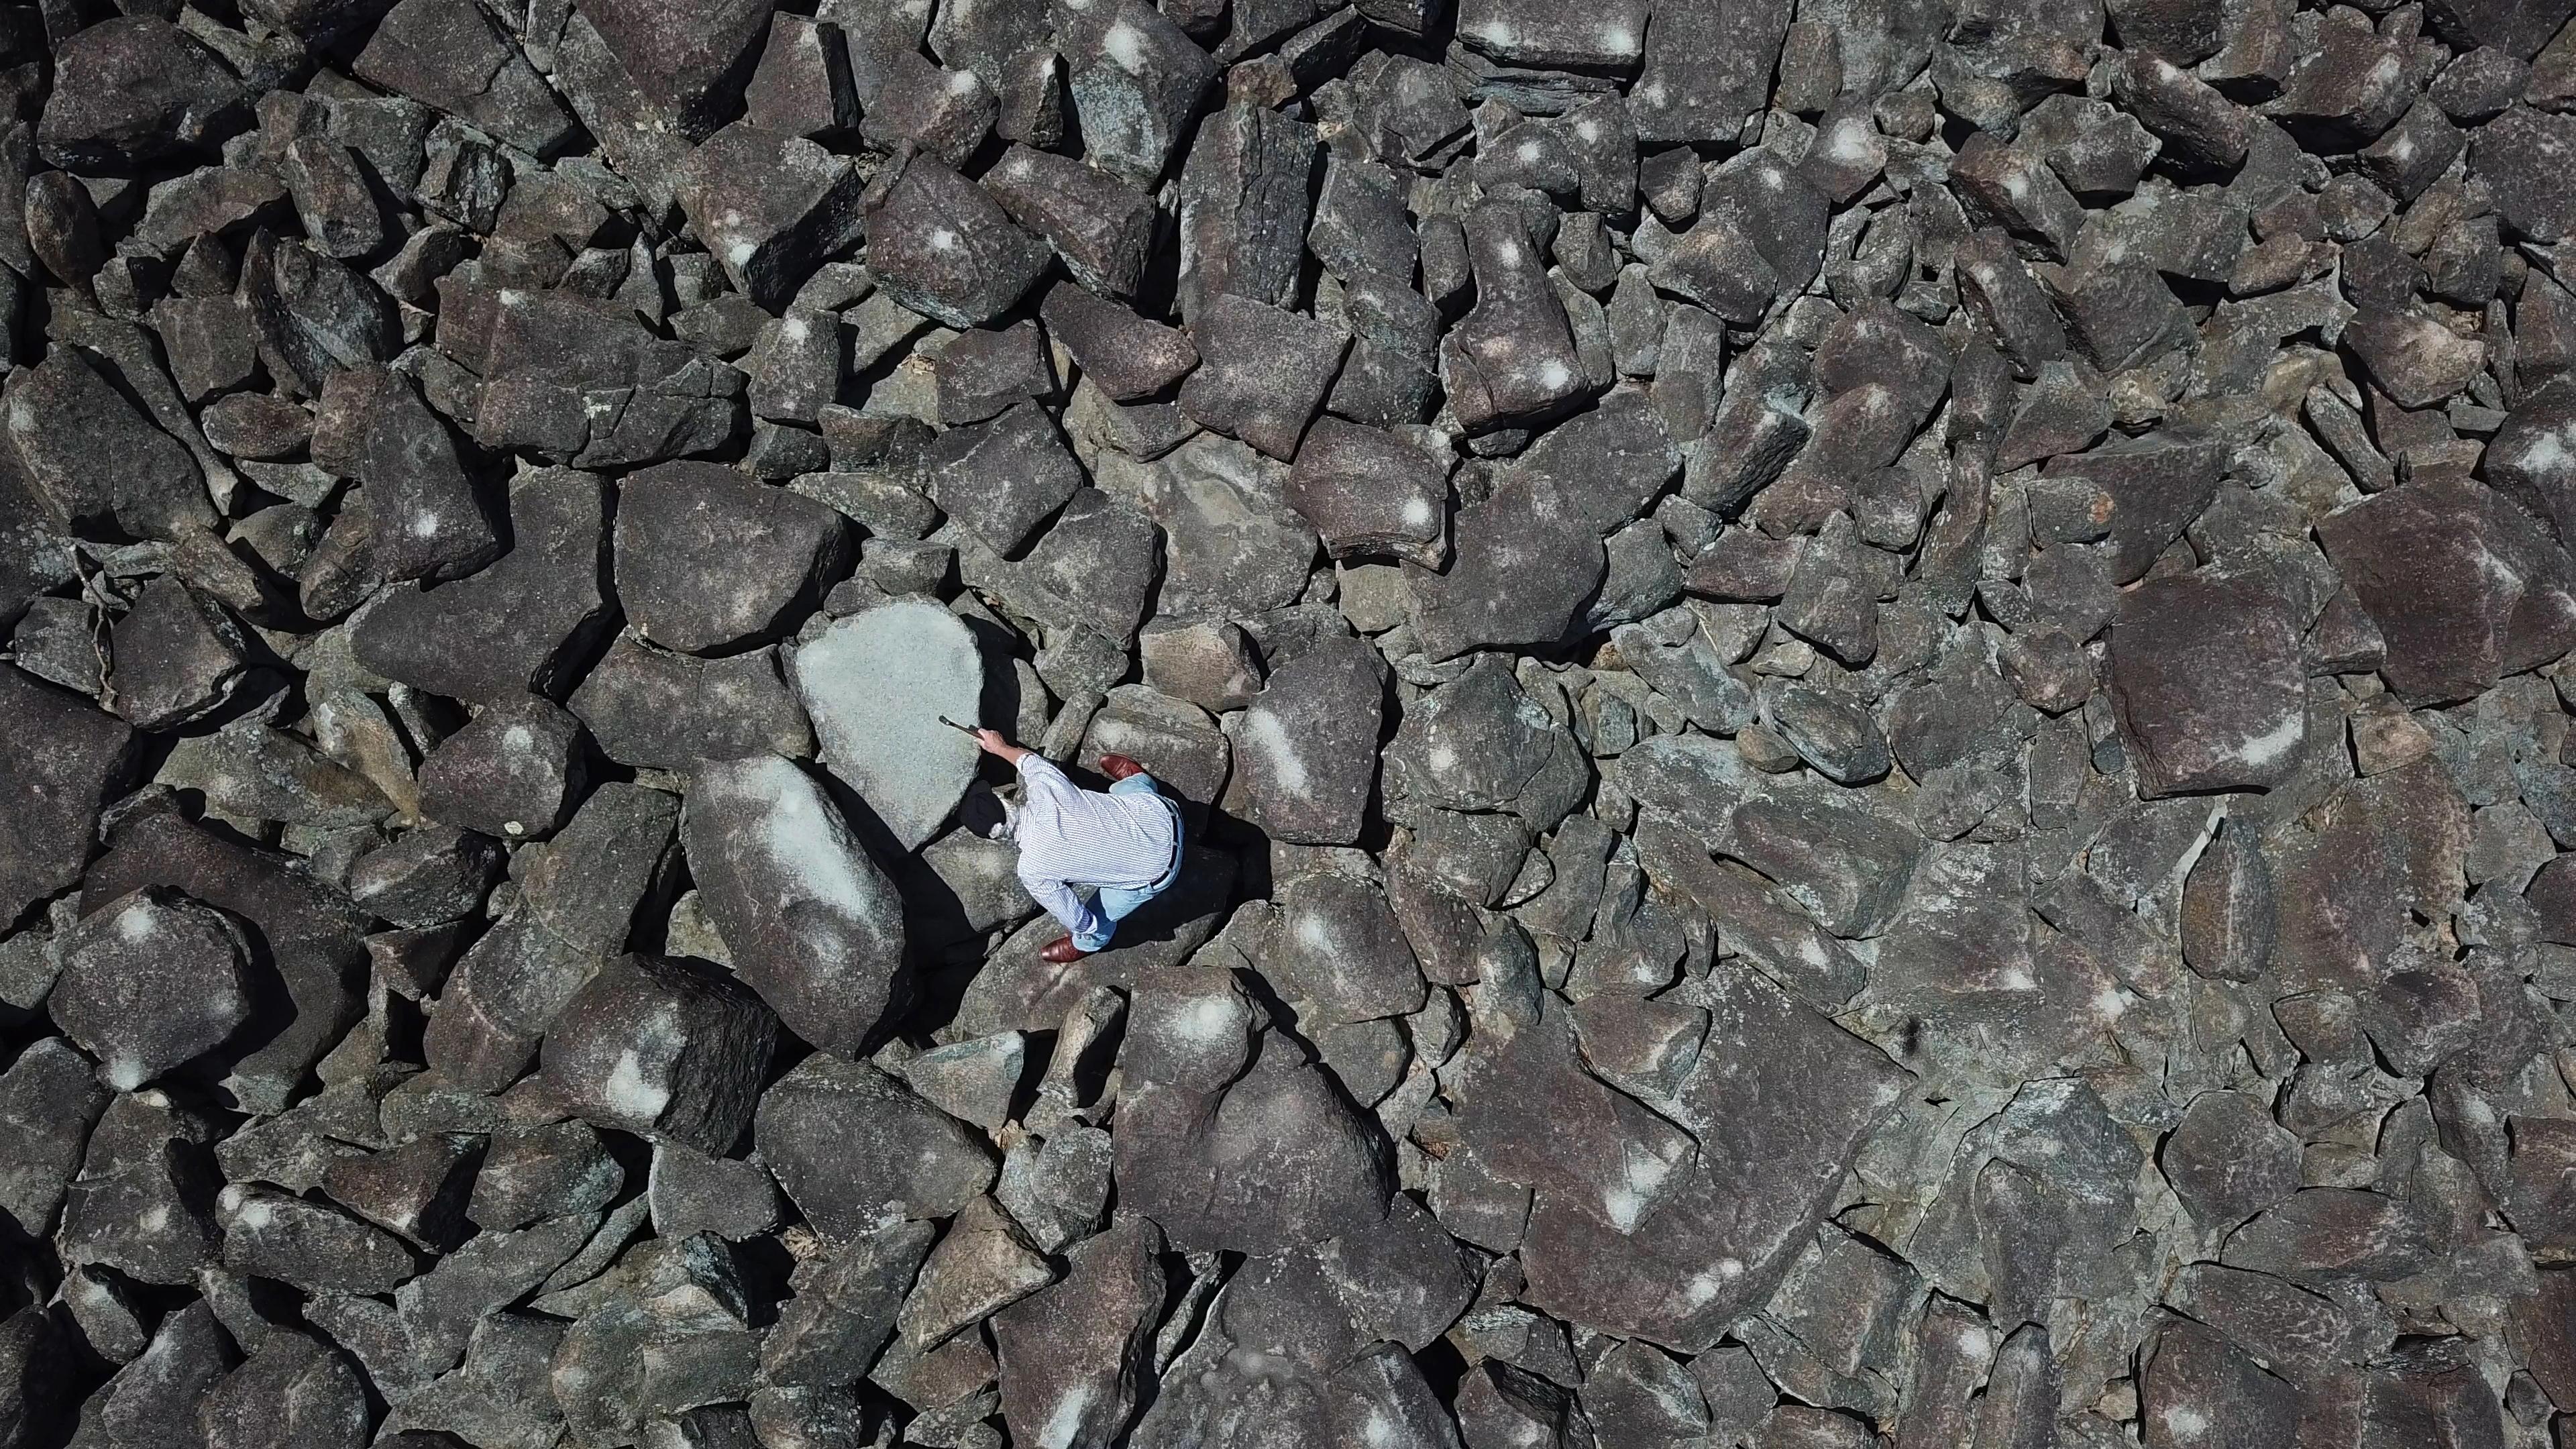 Curtis Nolley, 64, Harrisonburg, VA explores the ringing rocks of Upper Black Eddystone Thursday July 12, 2017. DAVID SWANSON / Staff Photographer .